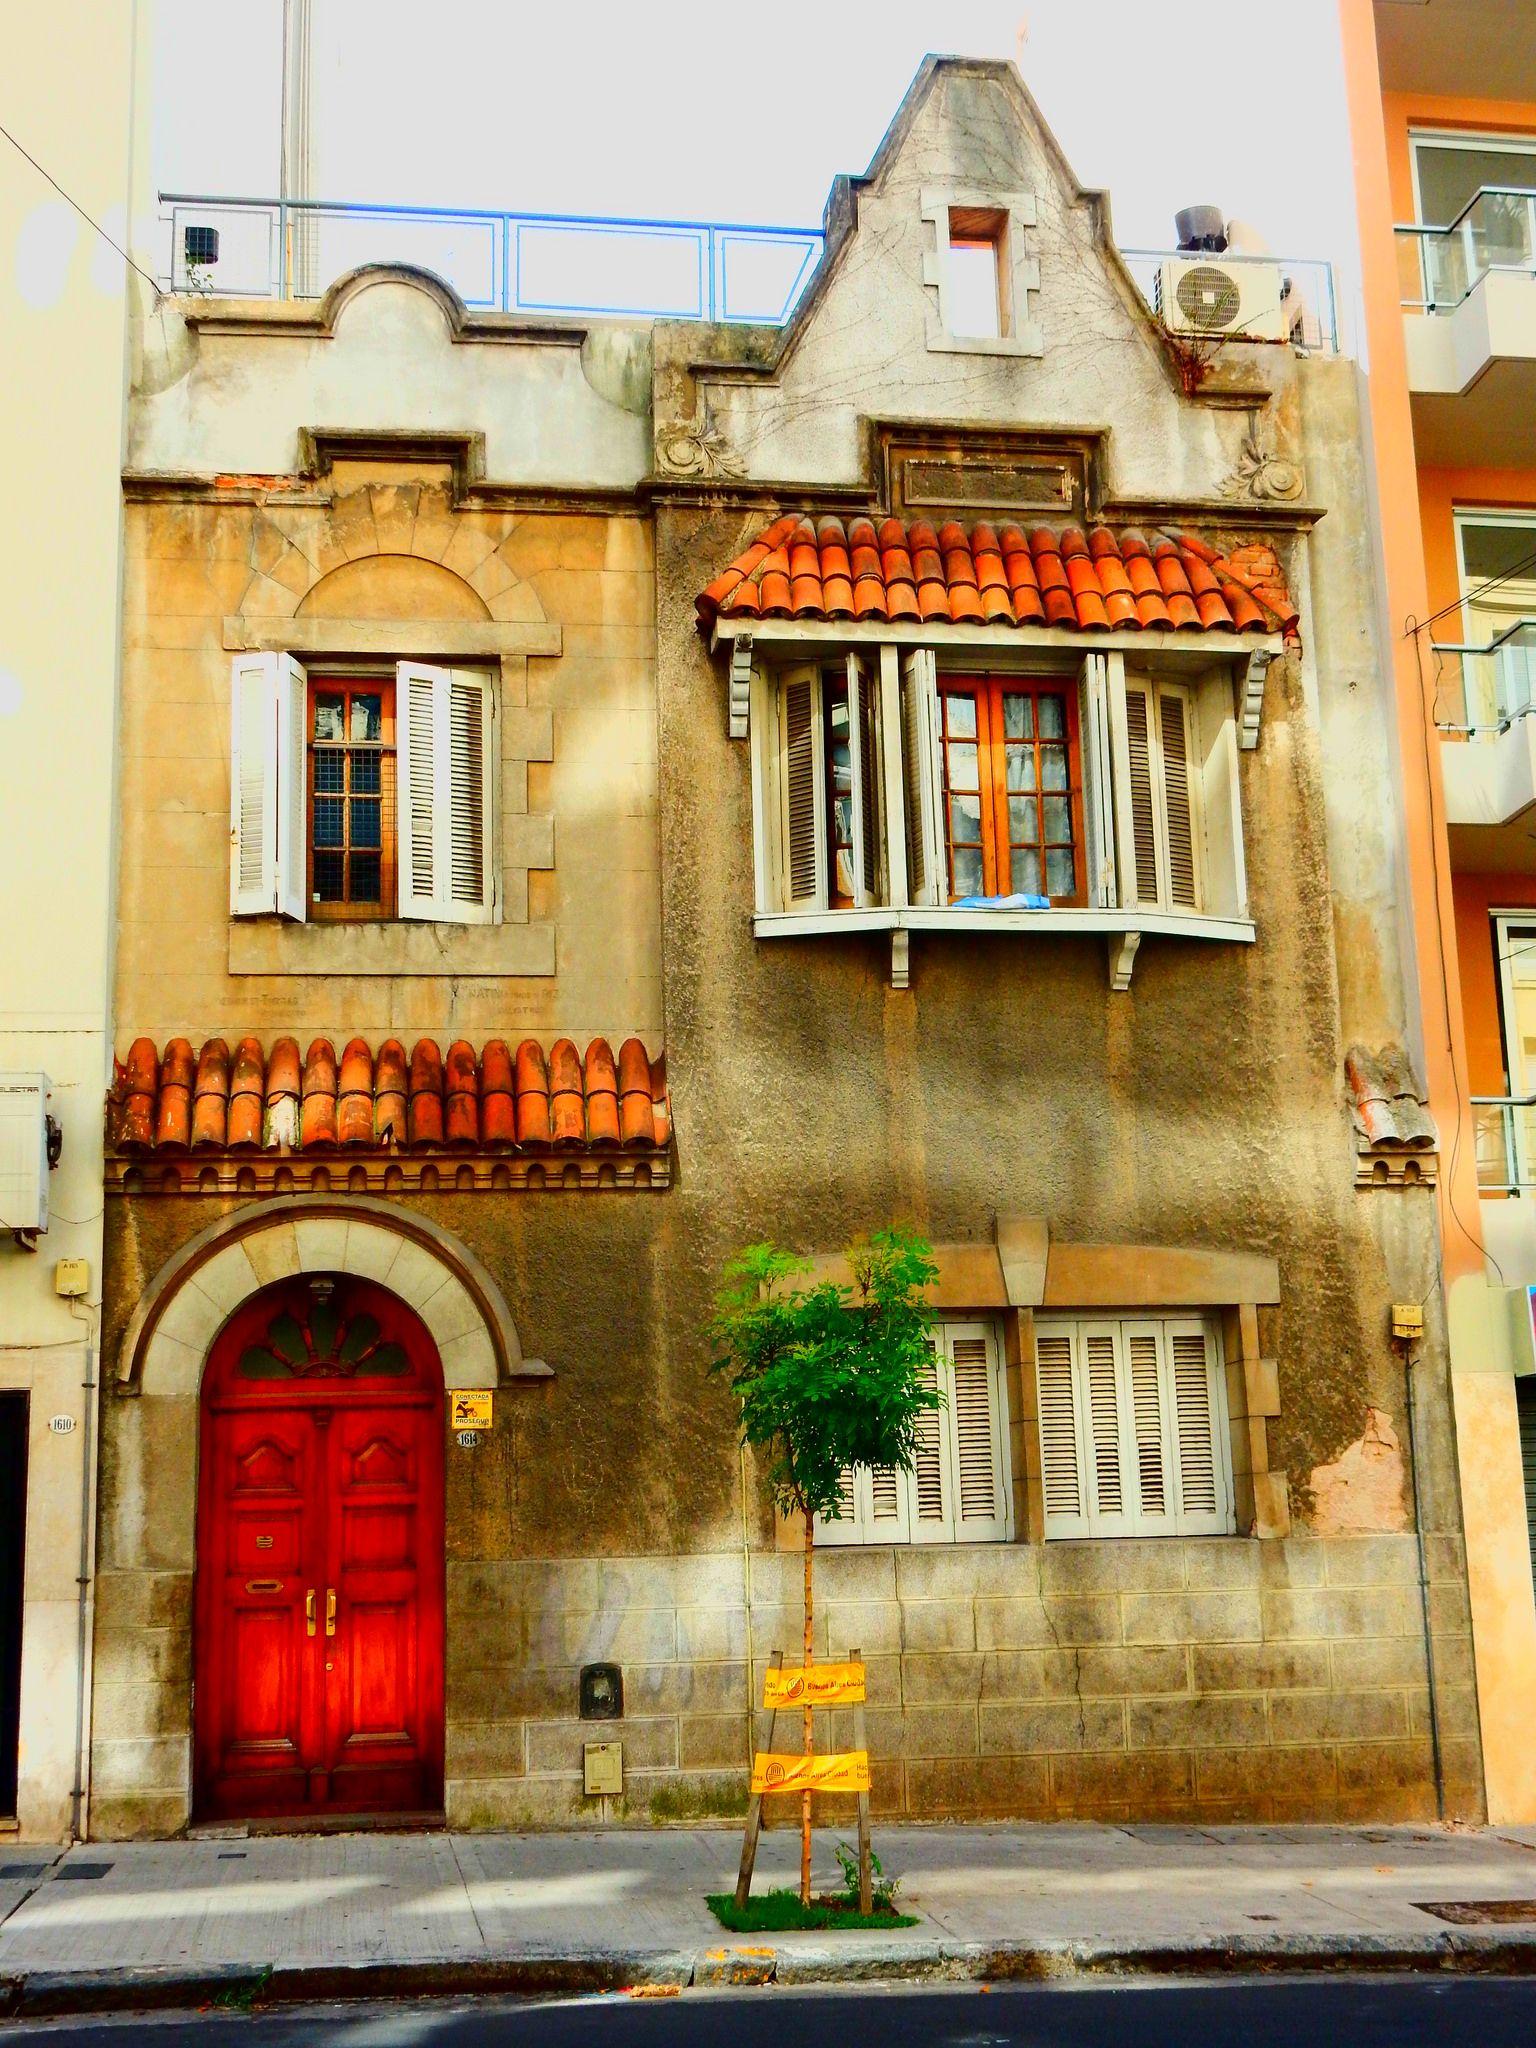 https://flic.kr/s/aHskzcAt4X | Calle Uriburu 1614, Recoleta, Buenos Aires | Calle Uriburu 1614, Recoleta, Buenos Aires